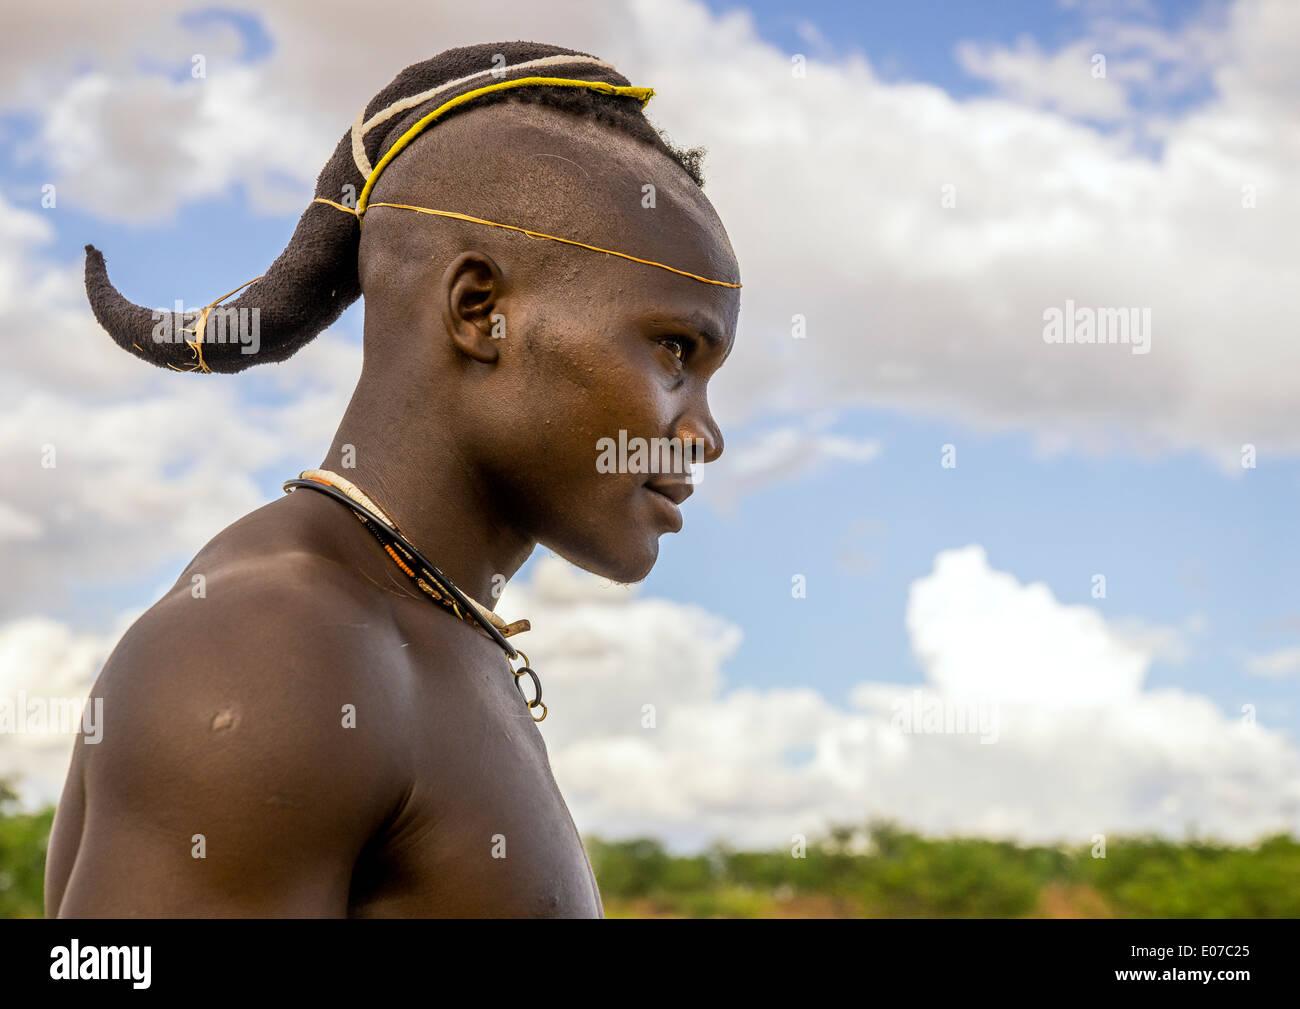 Solo Himba hombre con una trenza, Epupa, Namibia Imagen De Stock